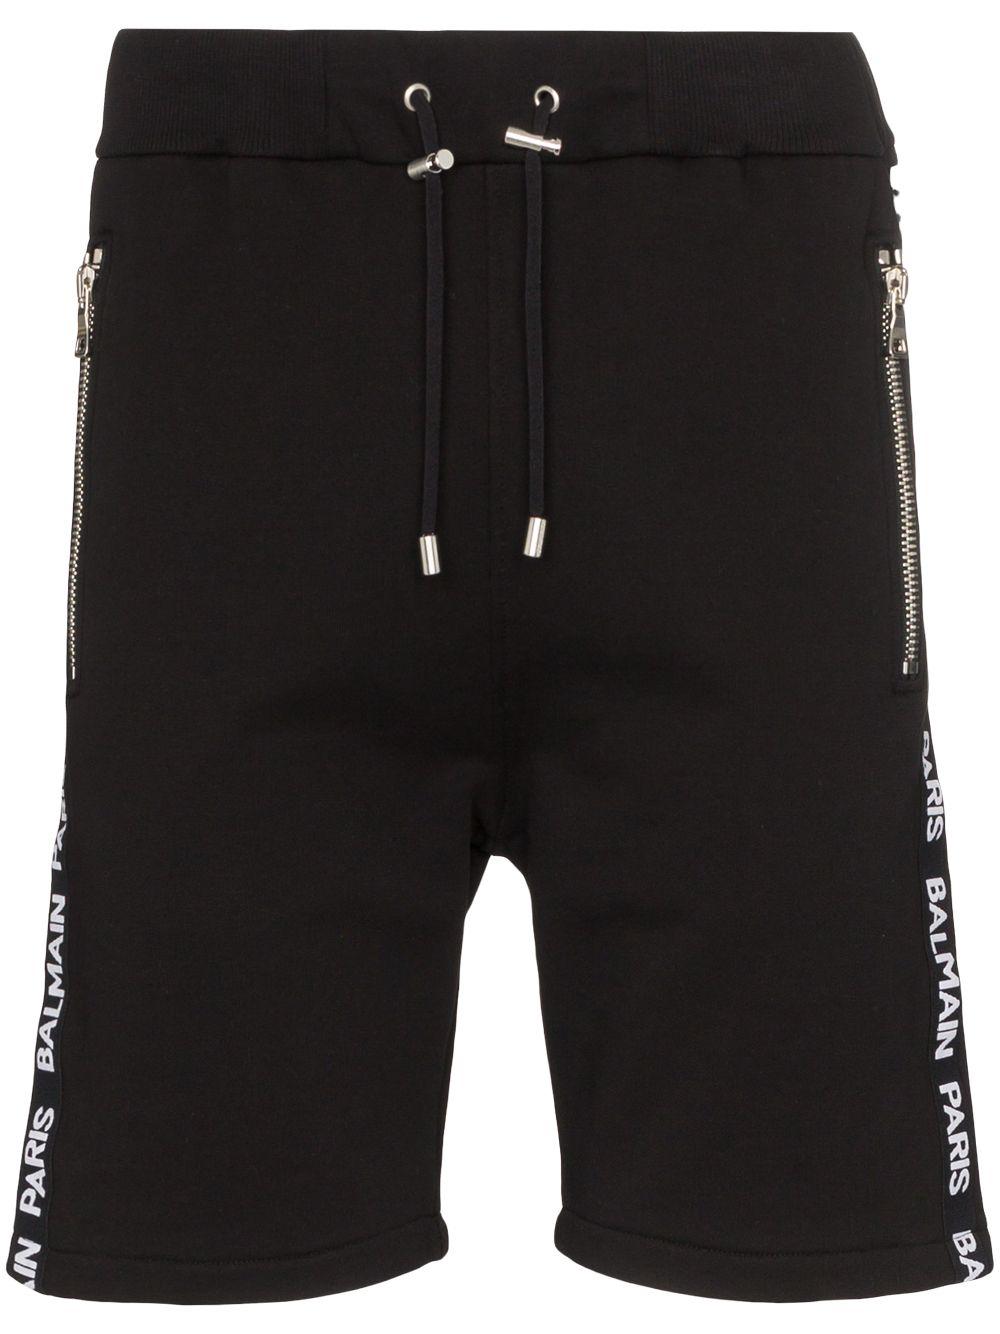 BALMAIN | Balmain спортивные шорты с логотипом на лампасах | Clouty